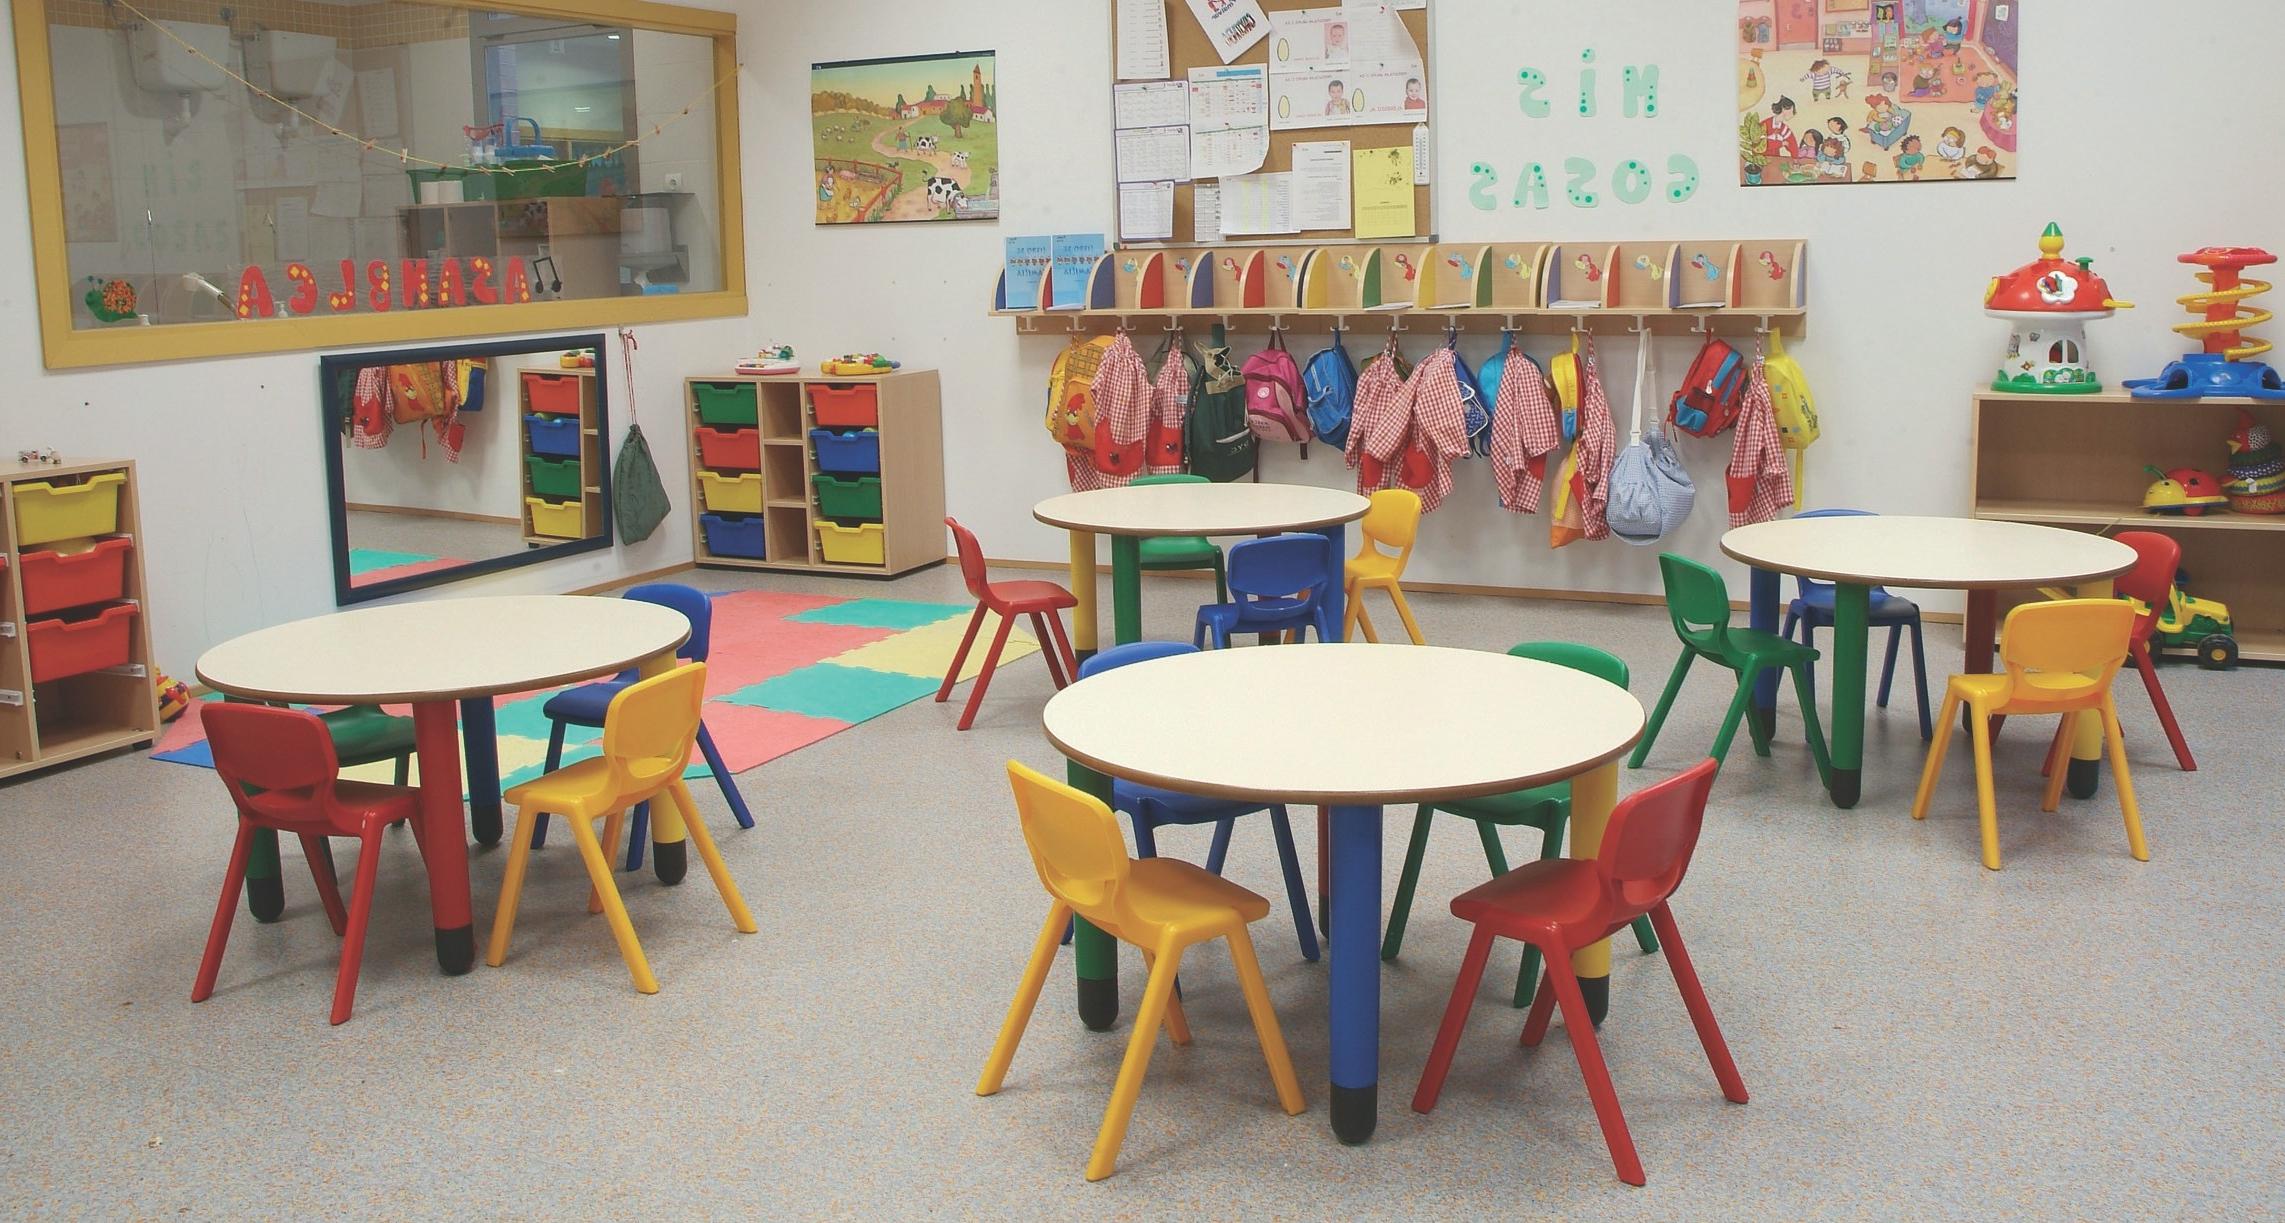 Mobiliario Escolar Infantil U3dh Mesa Escuela Infantil Mobiliario Escuela Infantil Mobiliario